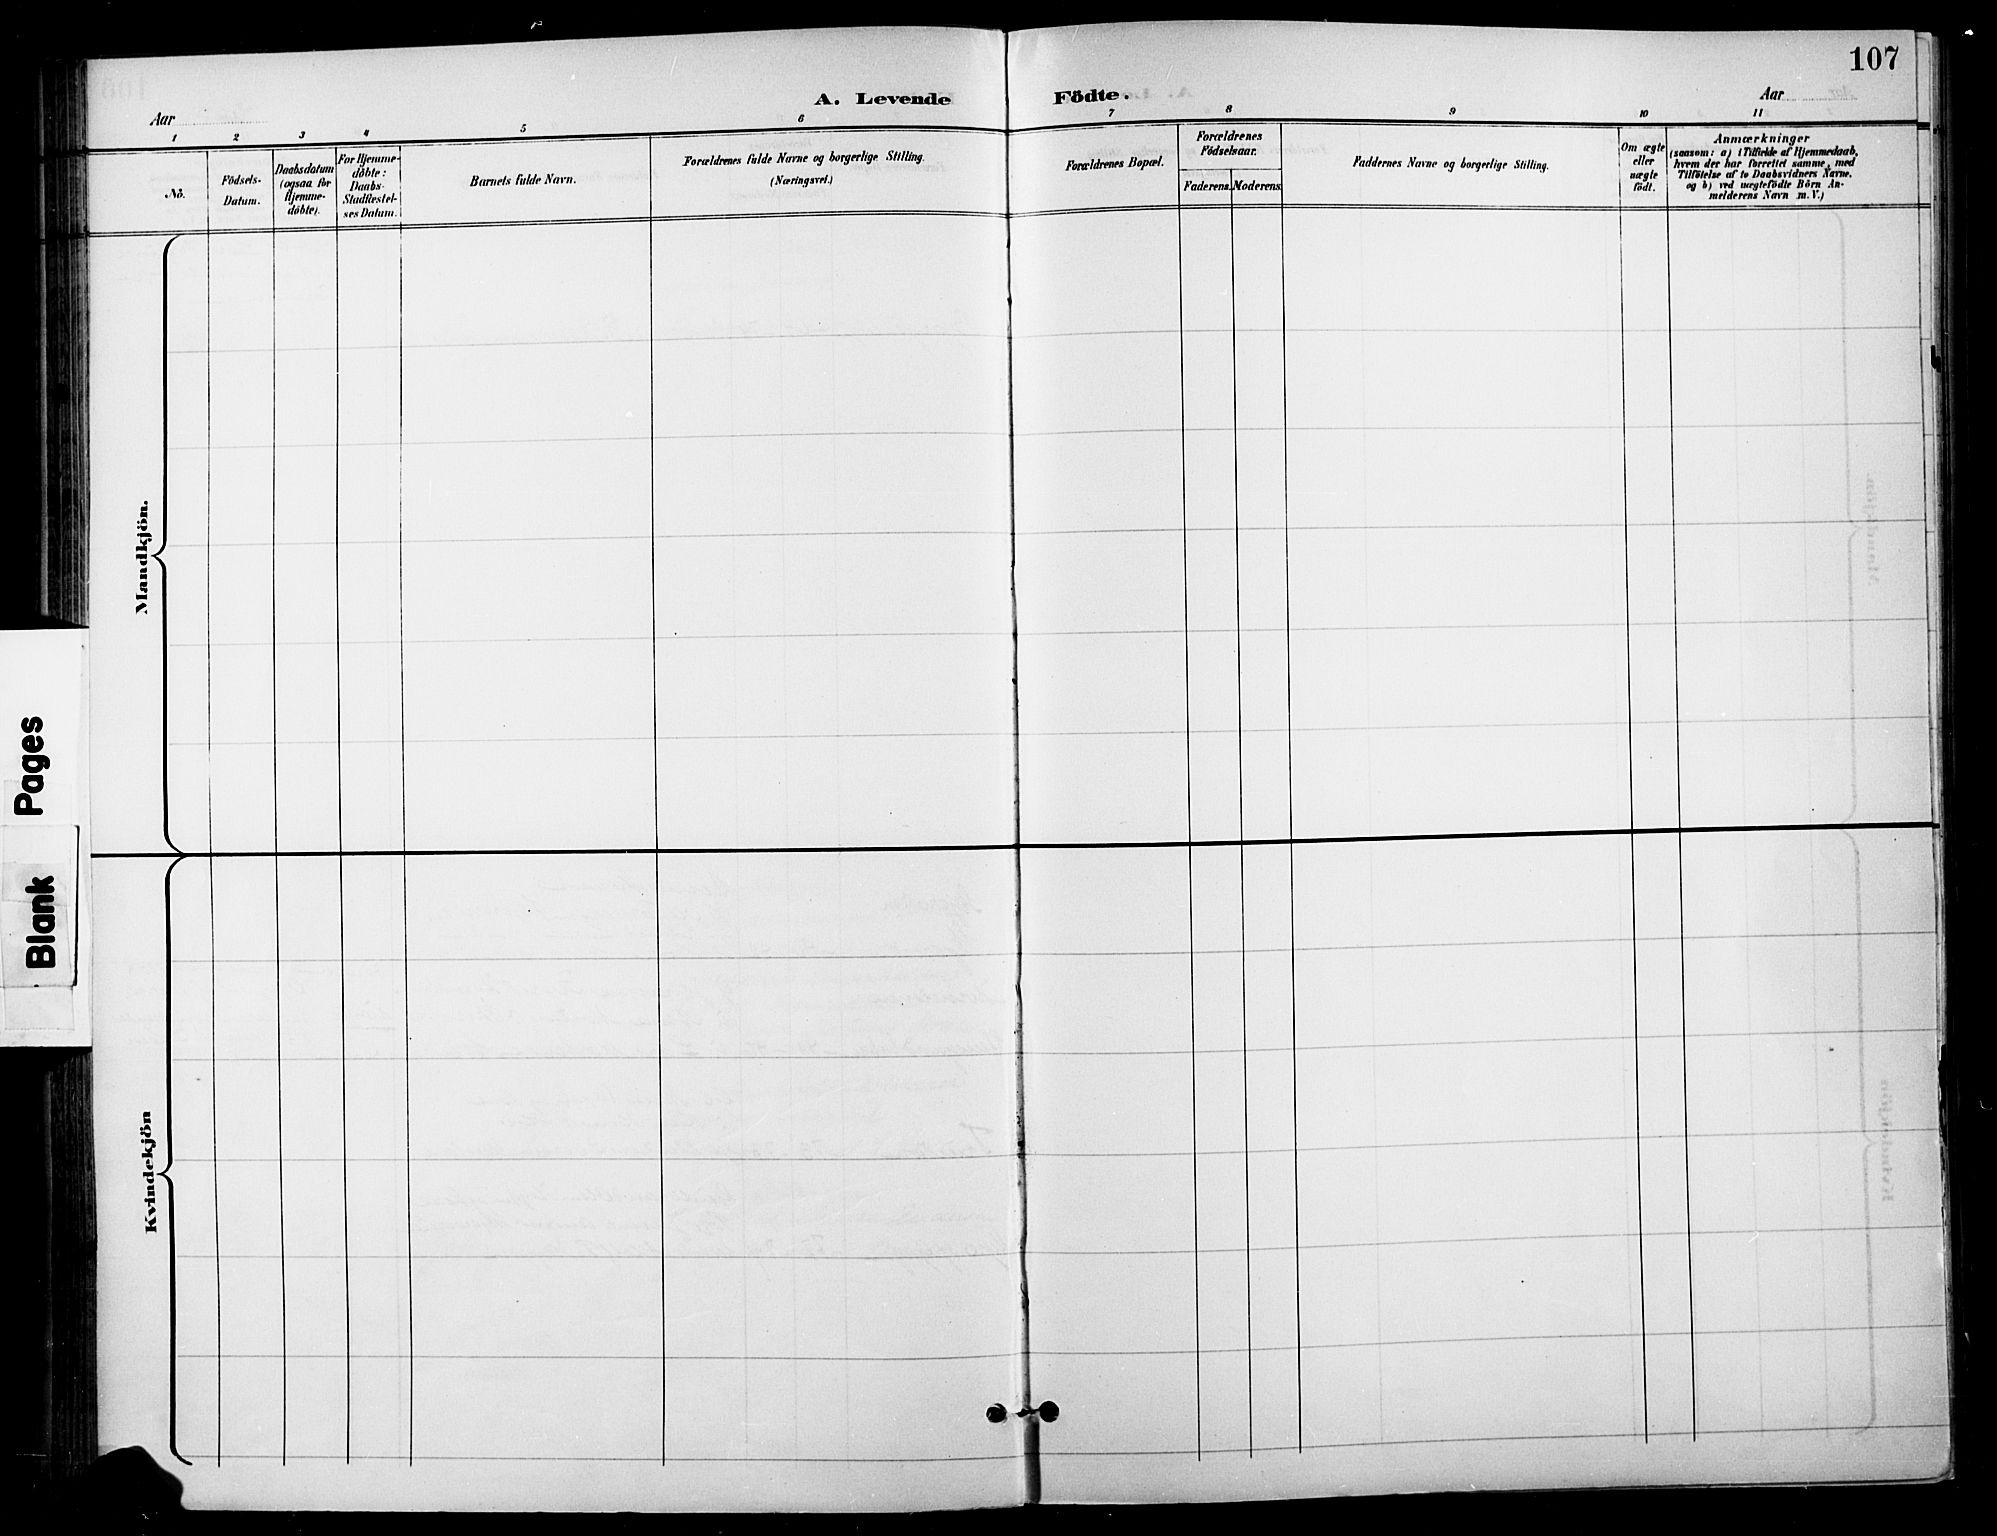 SAH, Gran prestekontor, Ministerialbok nr. 19, 1898-1907, s. 107